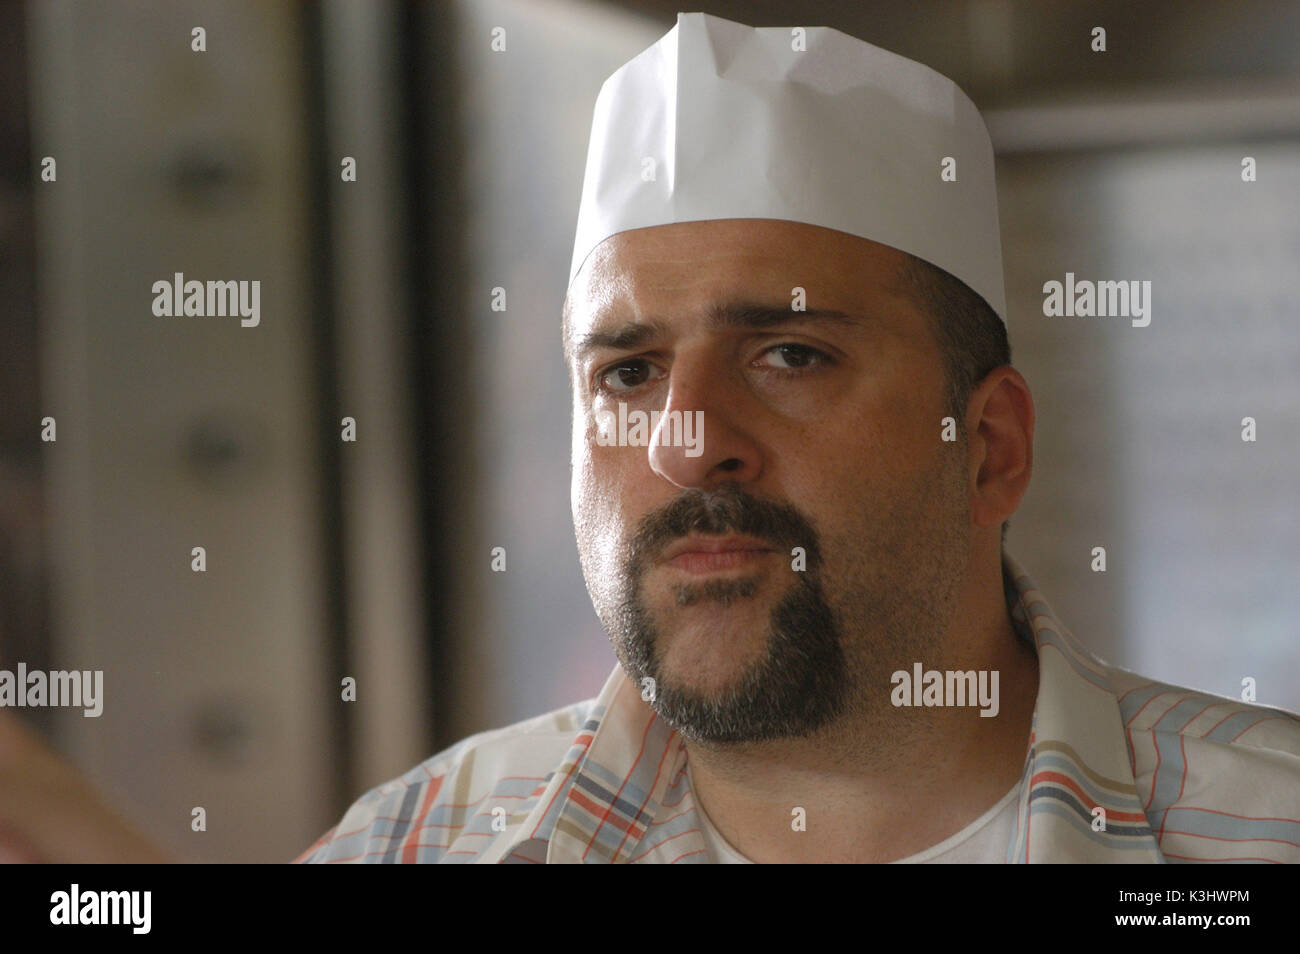 Pictured: Omid Djalili as Melik. ALIEN AUTOPSY Omid Djalili     Date: 2006 - Stock Image